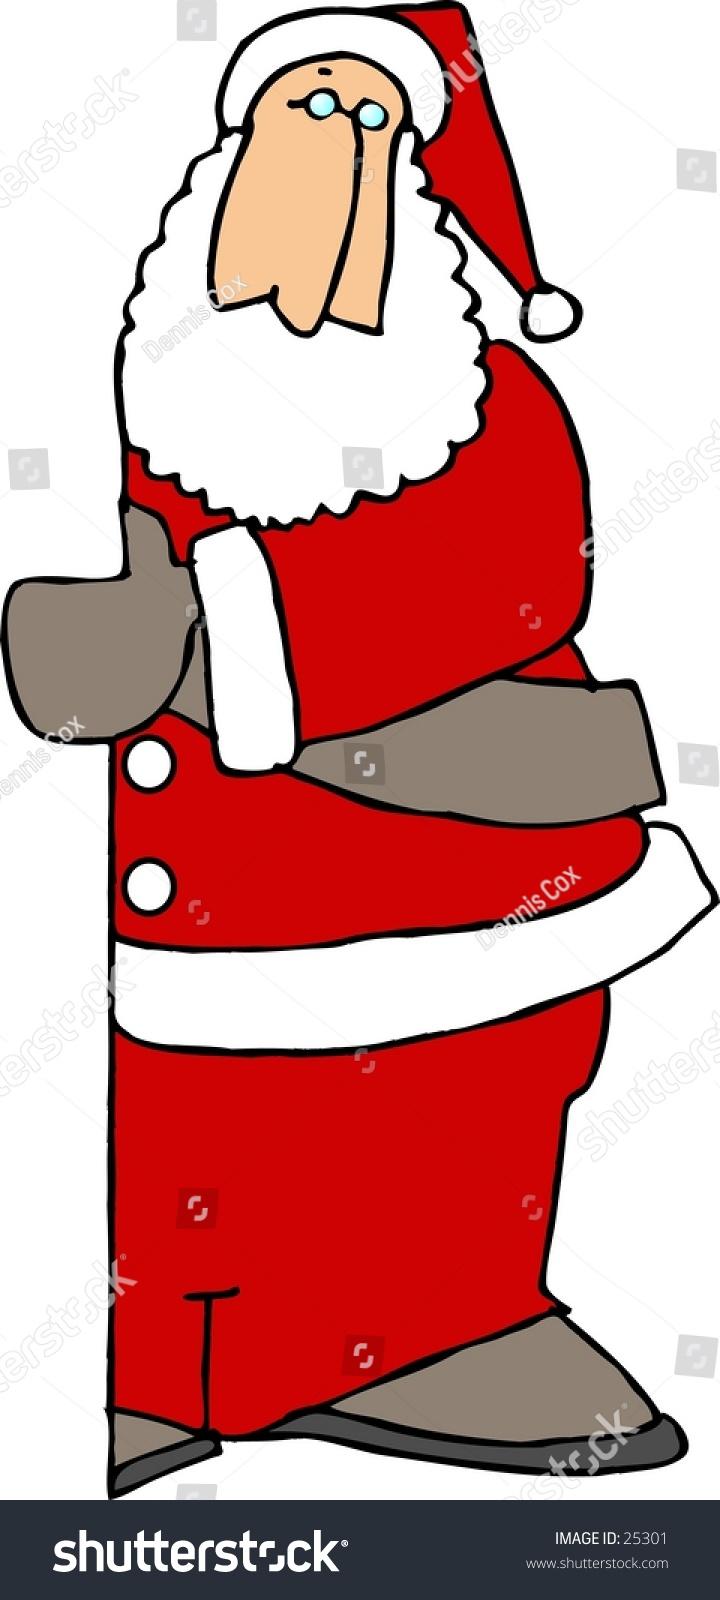 medium resolution of clipart illustration of santa claus peeking around a door